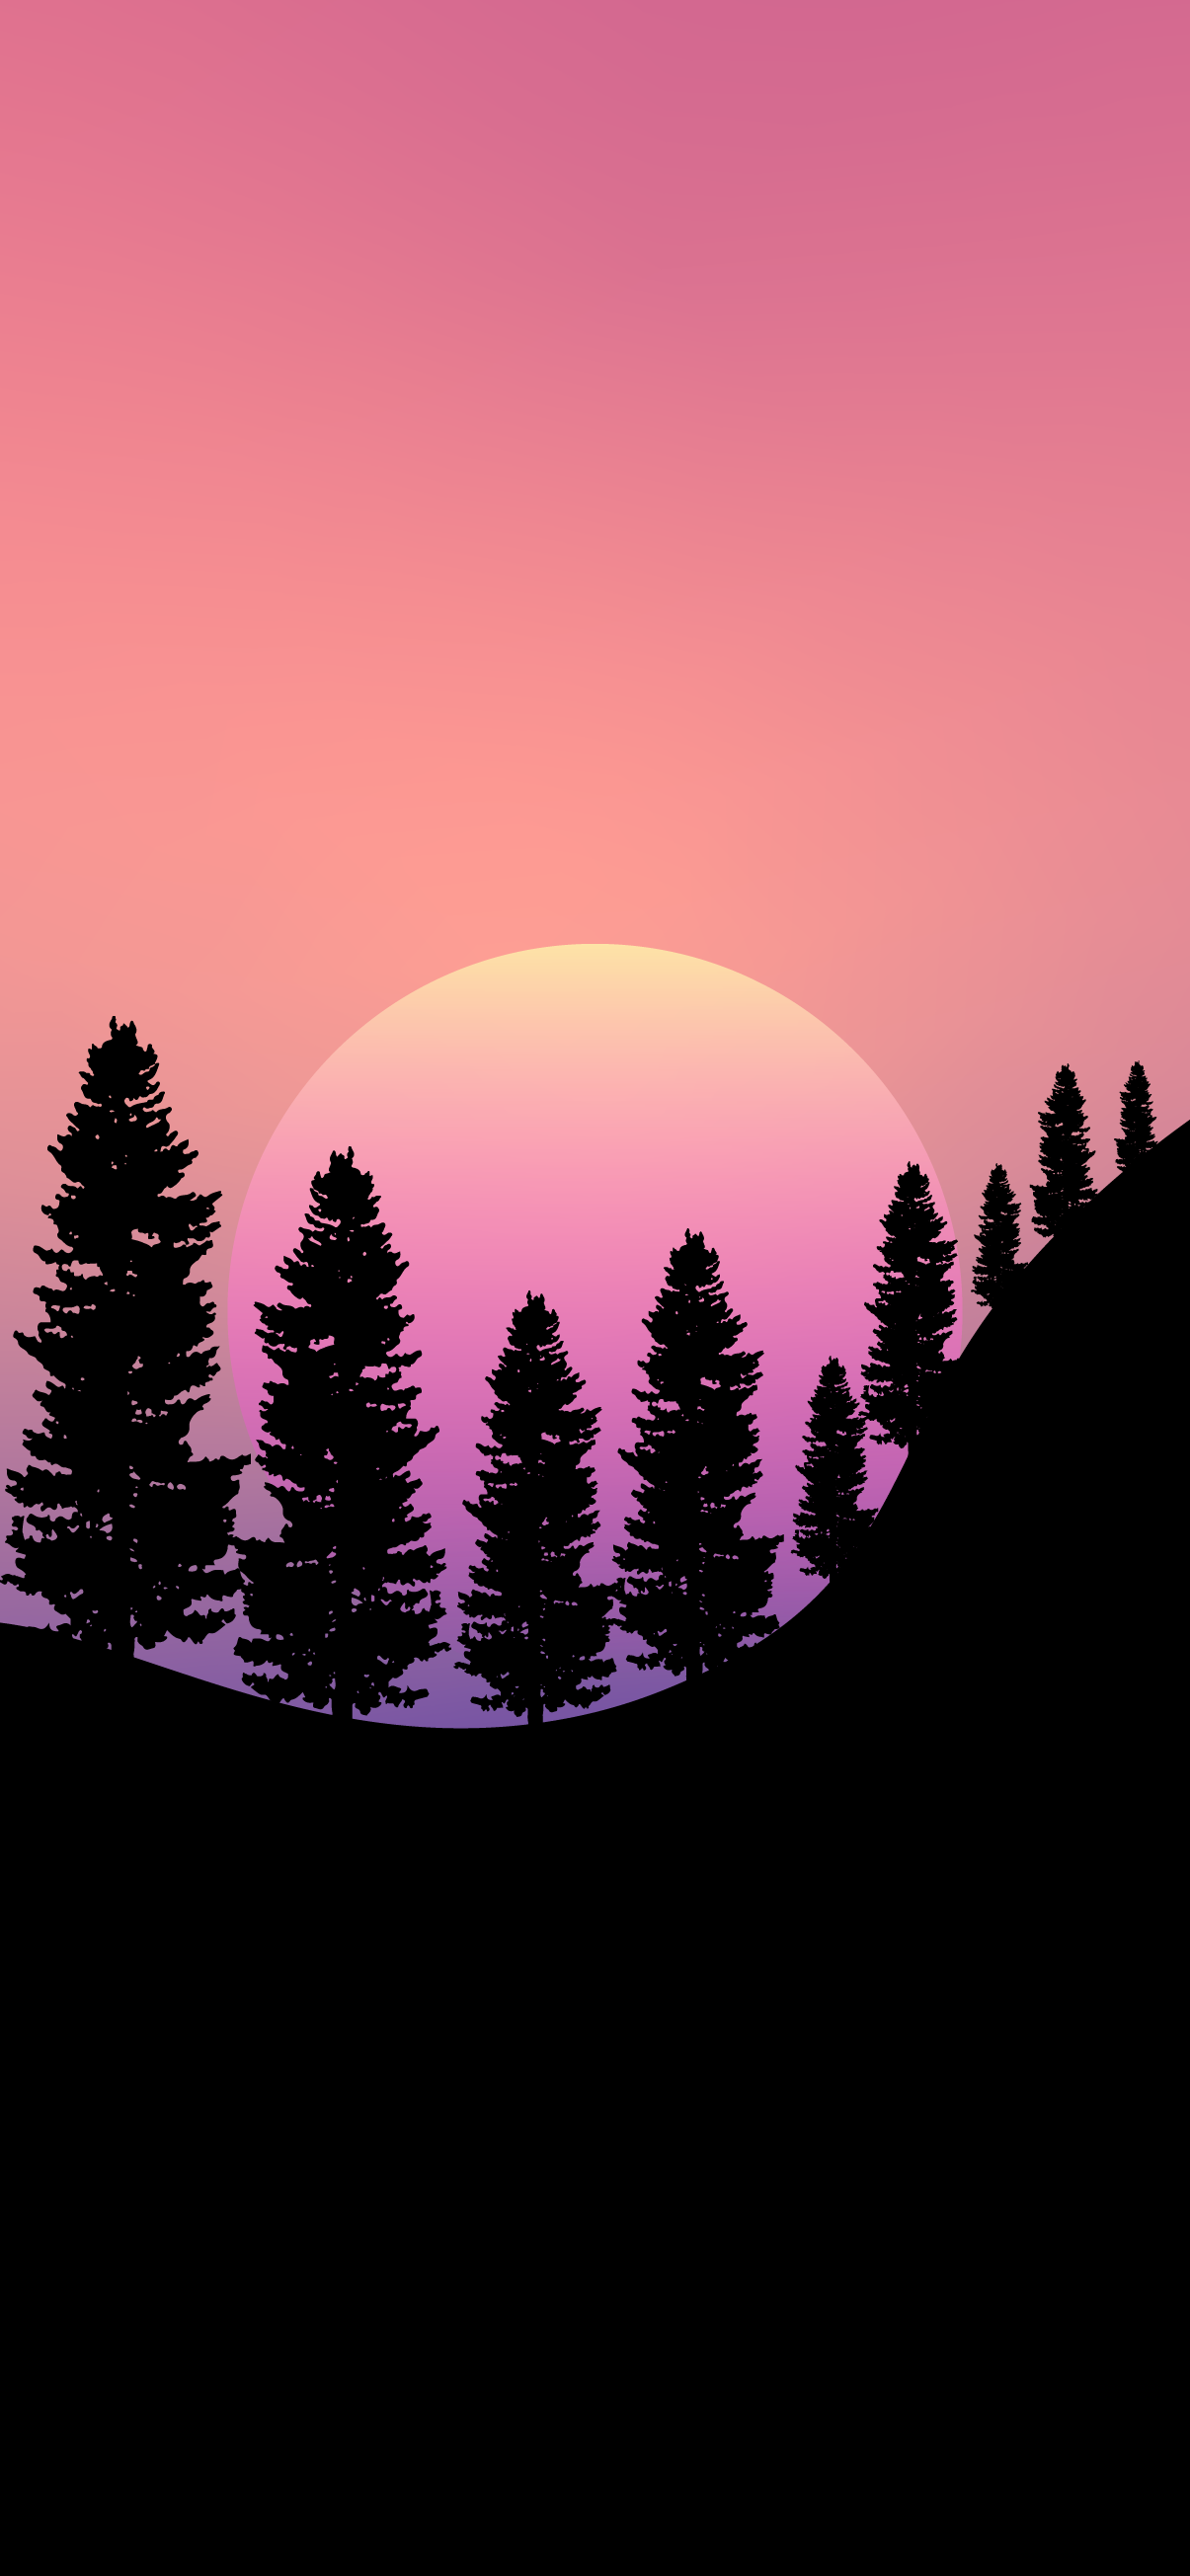 minimal forest tree landscape silhouette sunset wallpaper 4k